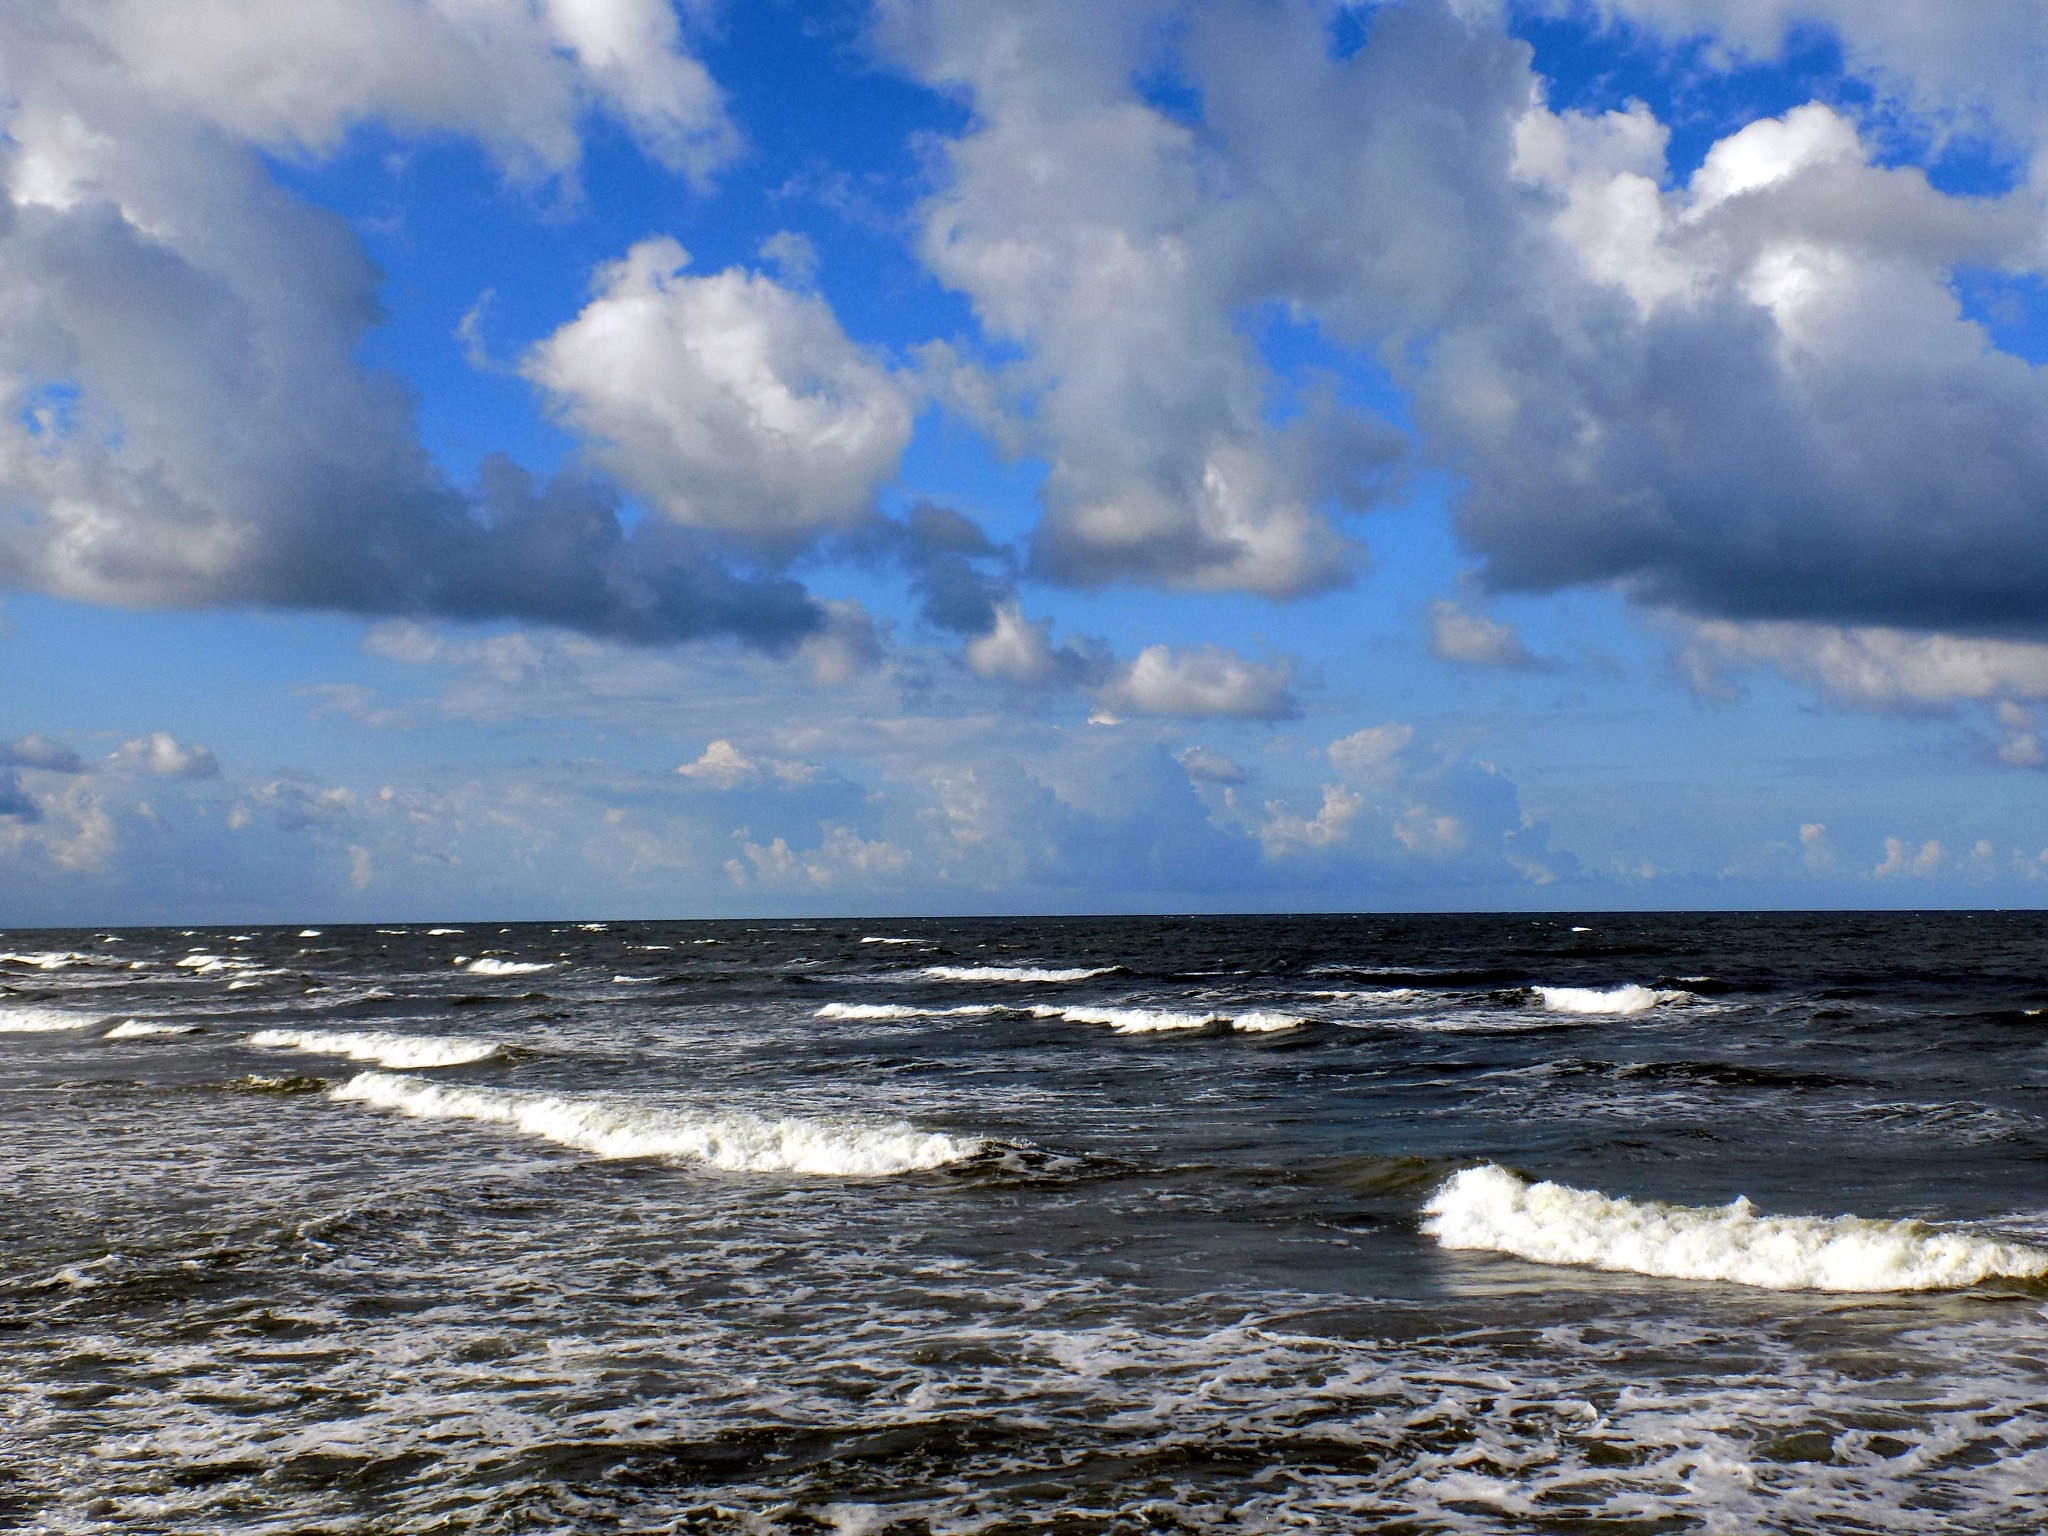 Sky and sea by uzkuraitiene62